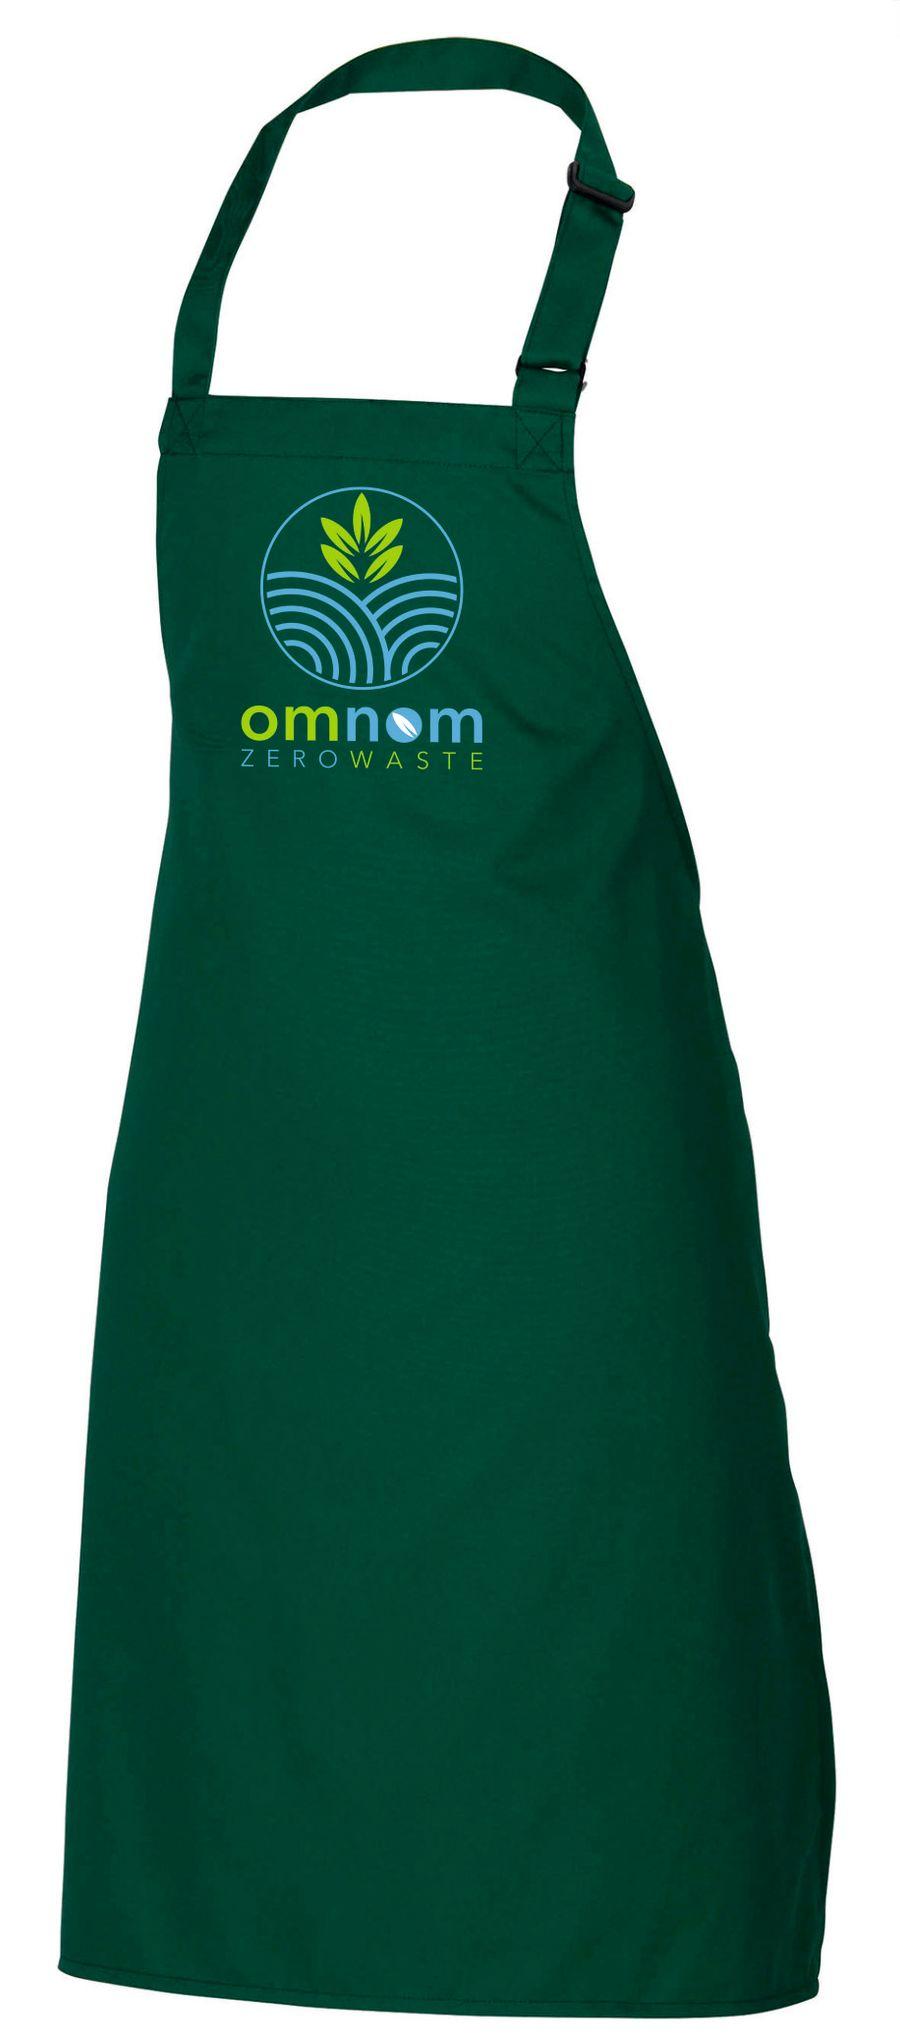 OMNOM ZERO WASTE cotton adult craft apron Embrodiered